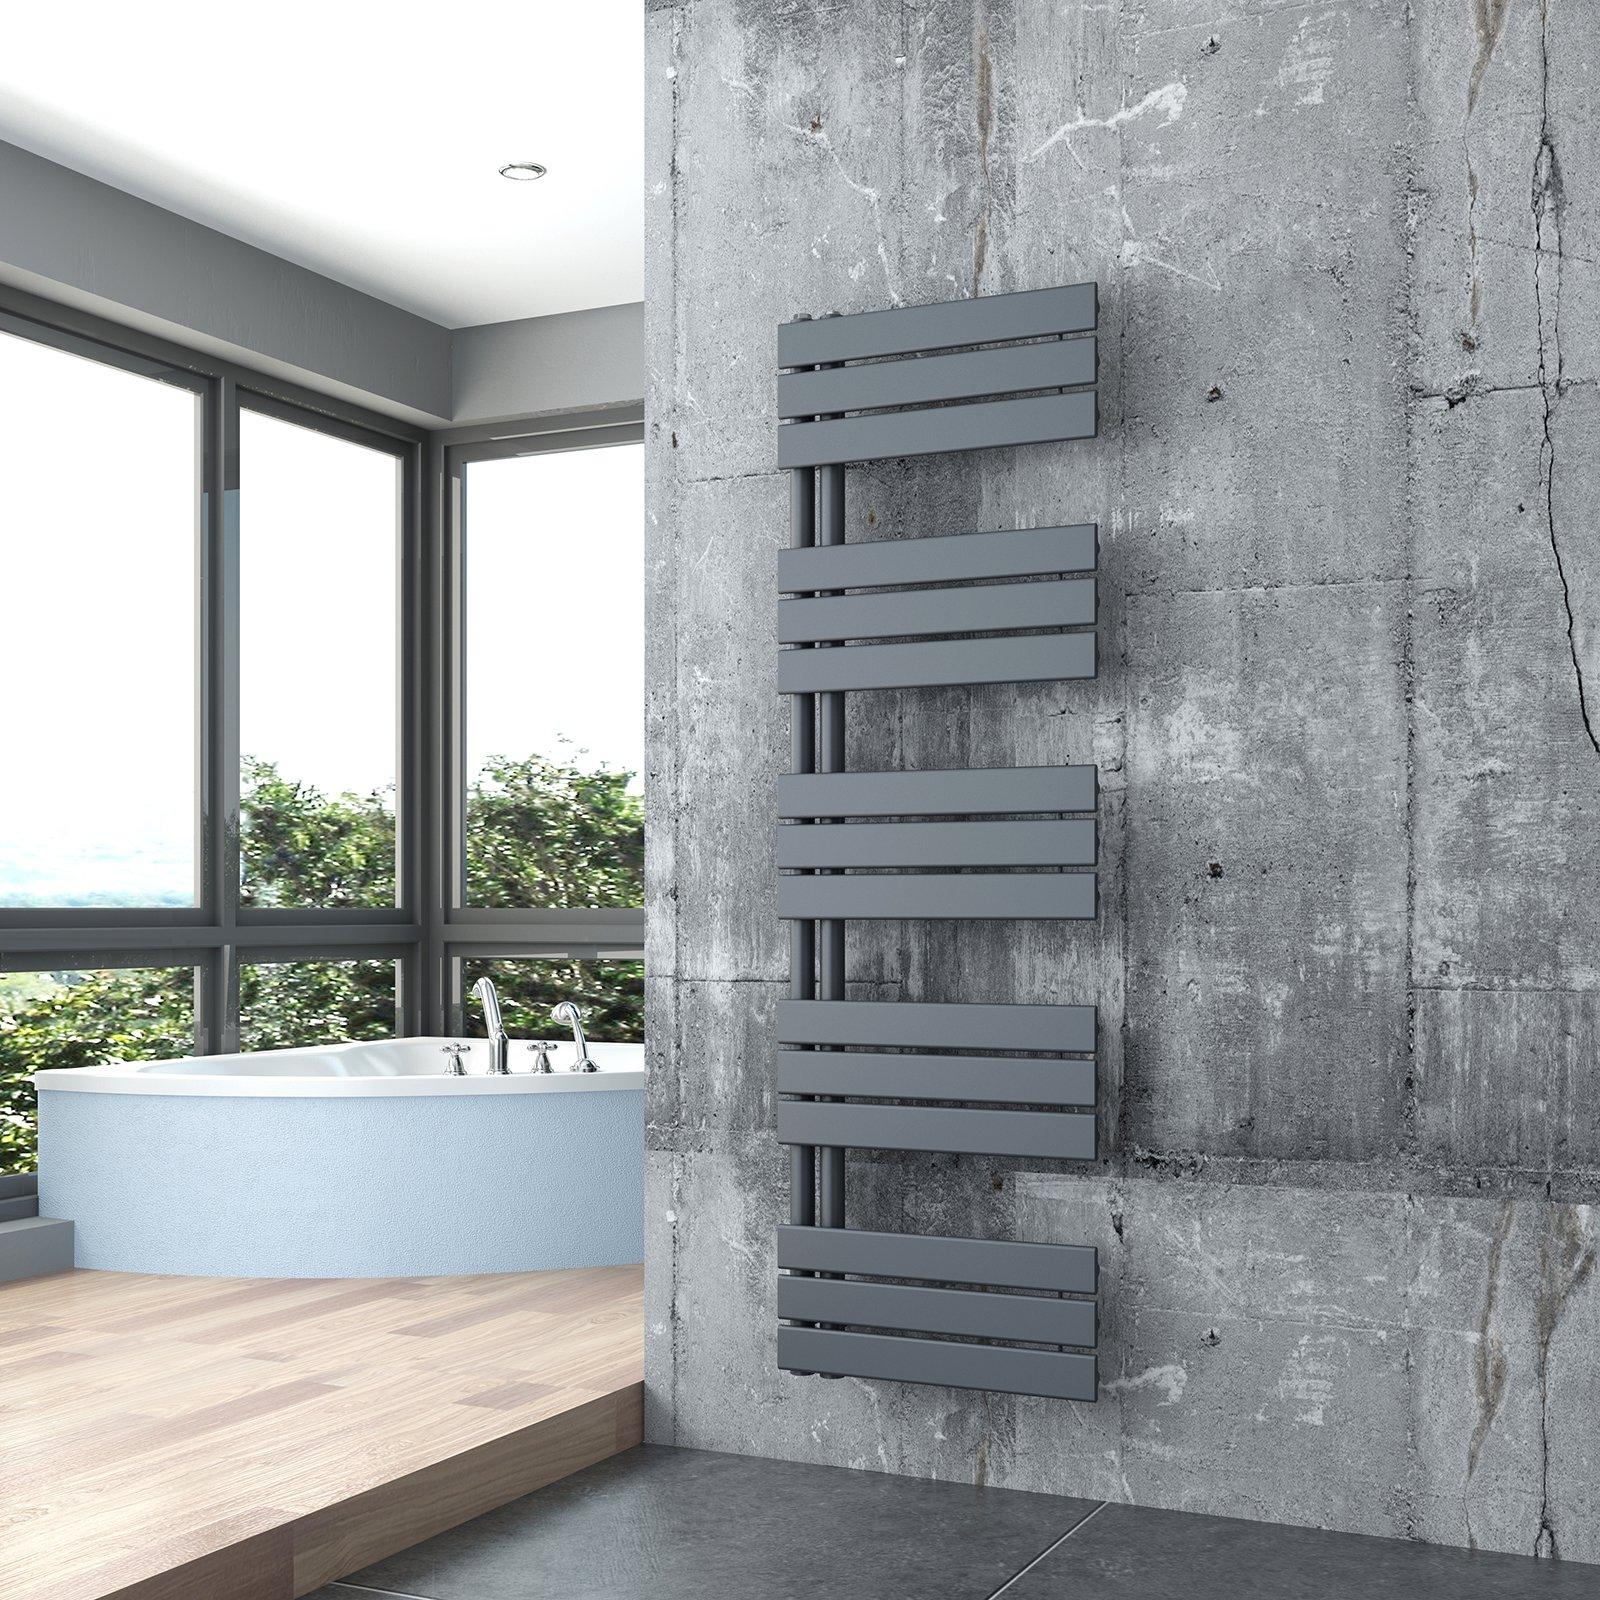 Design Badheizkörper Handtuchwärmer D16G in Anthrazit - Größe wählbar